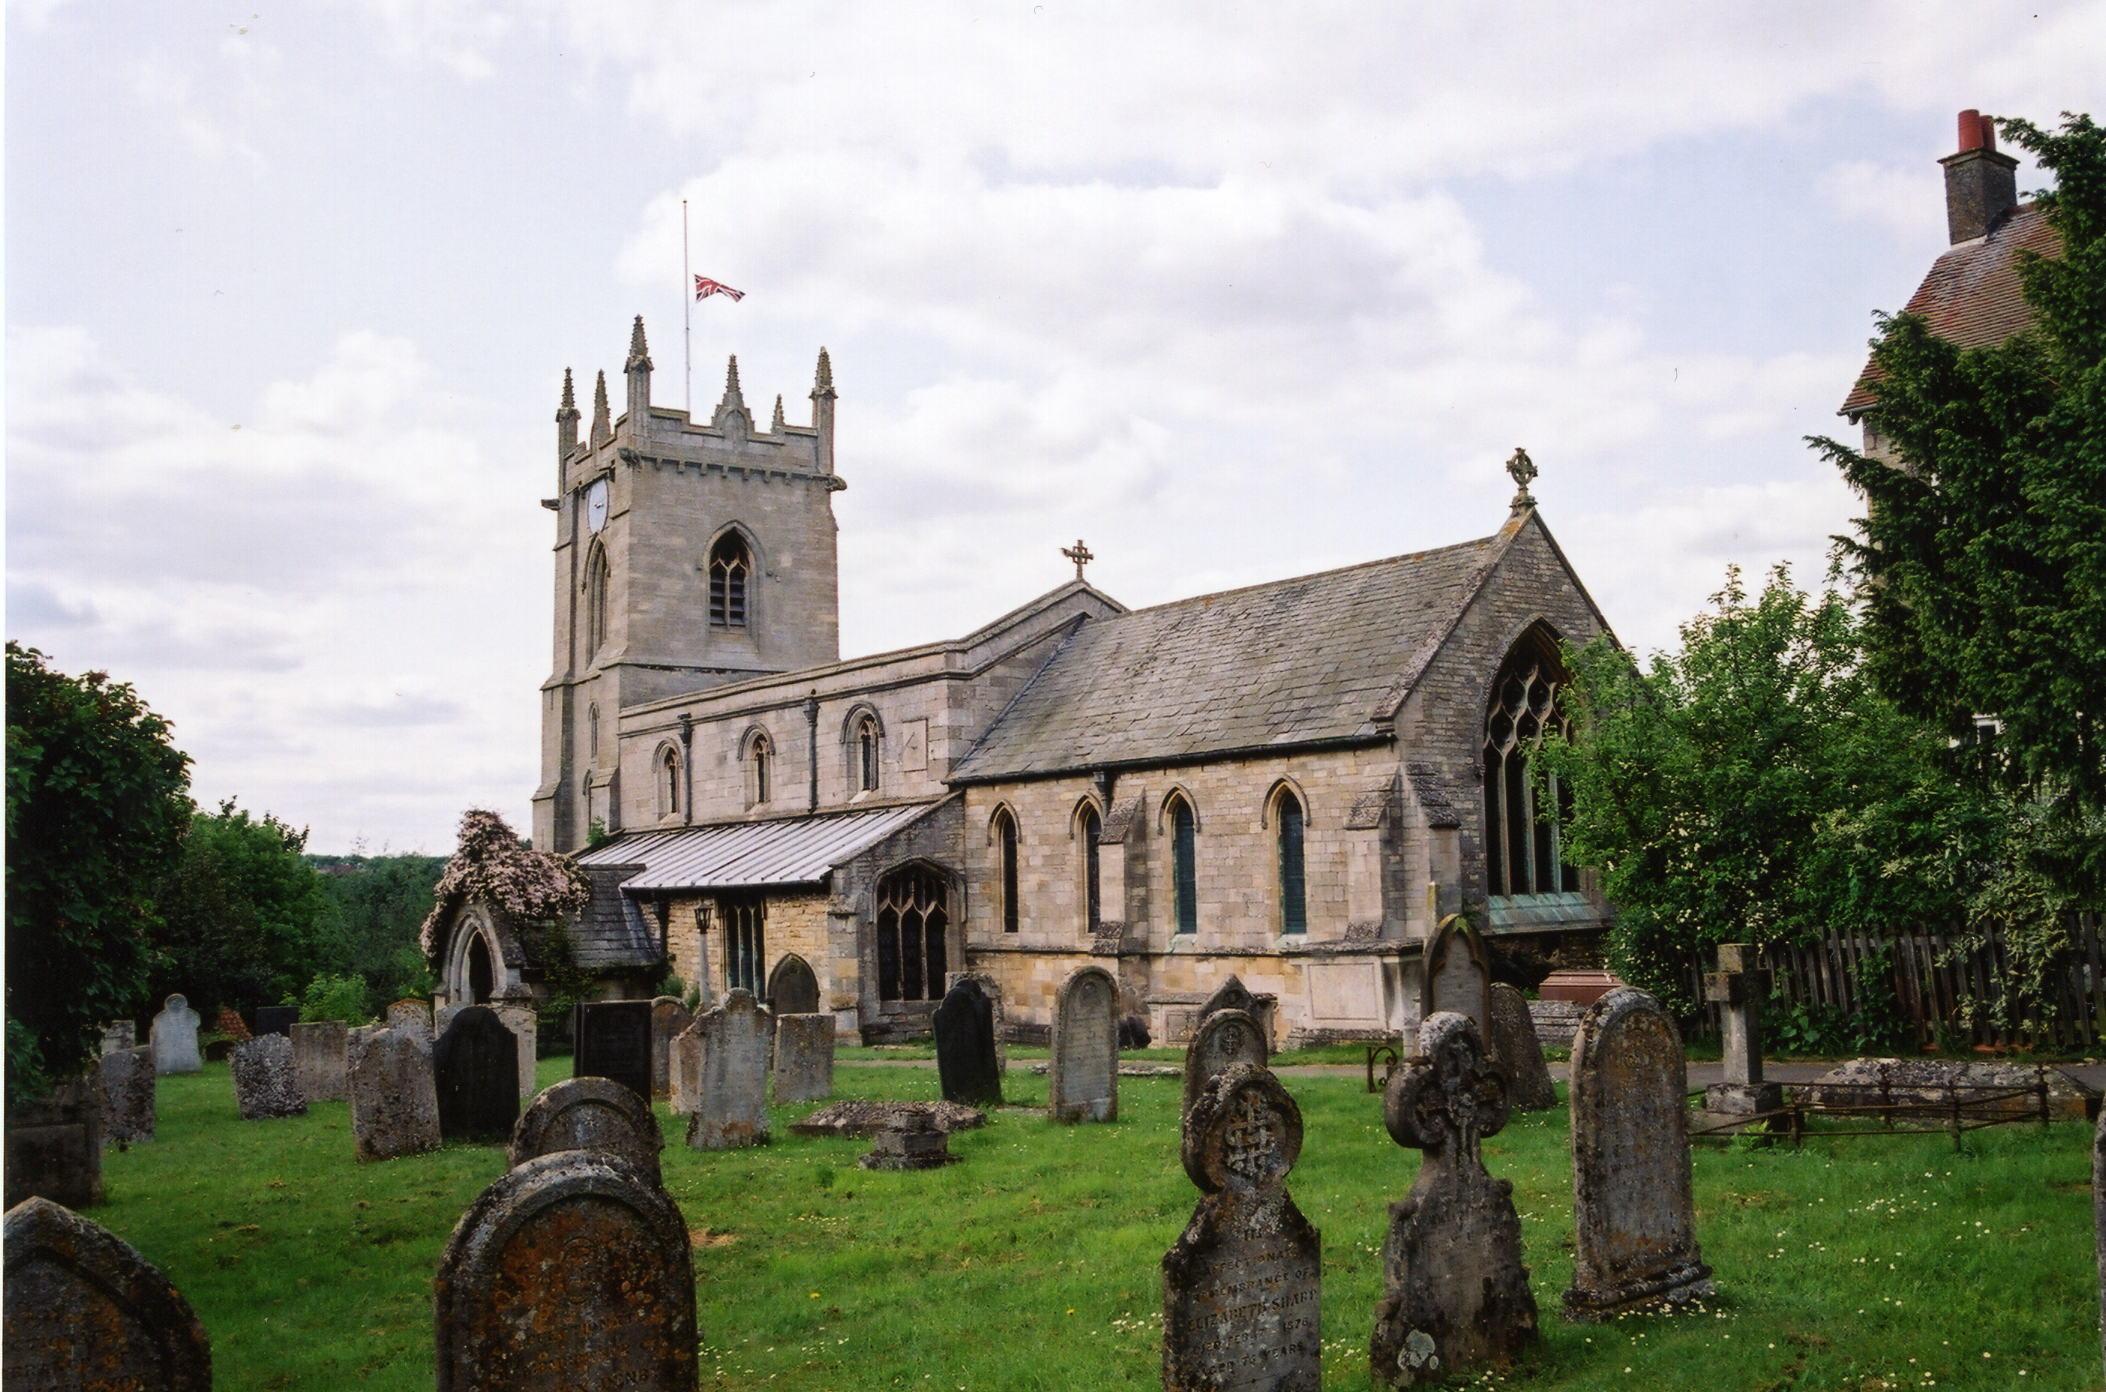 Colsterworth St. John the Baptist Church